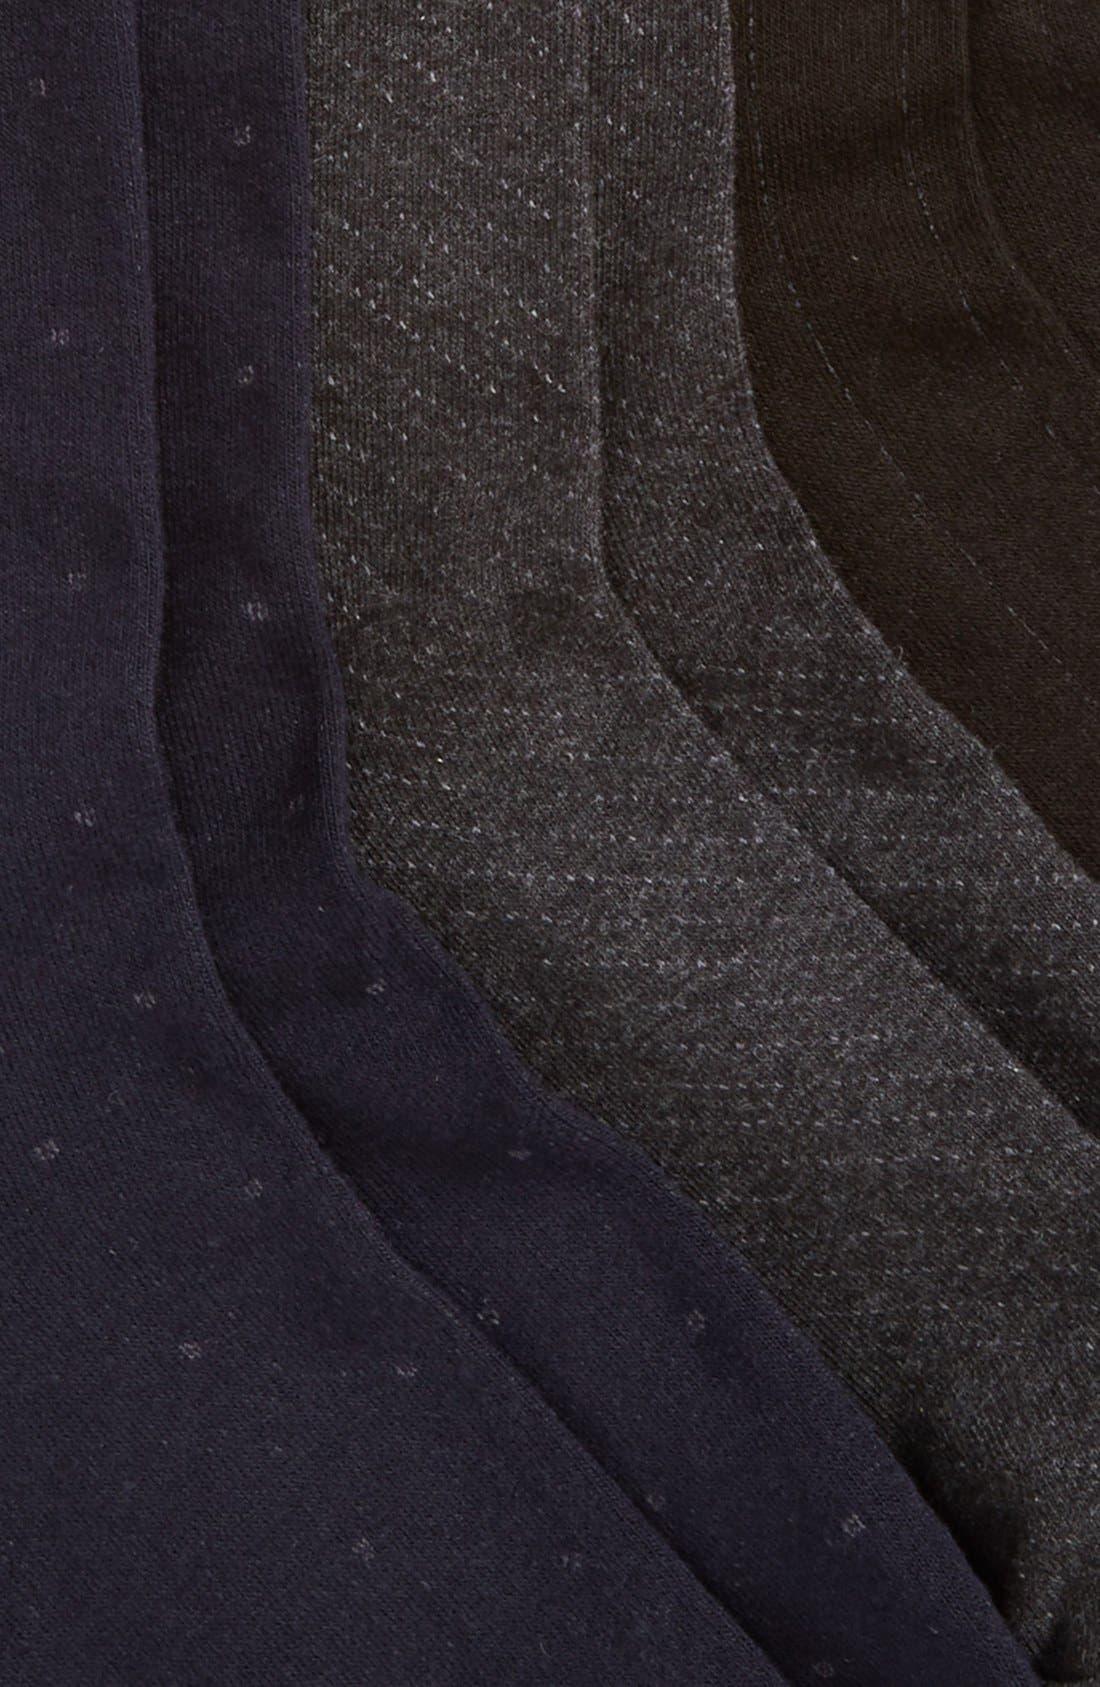 Dress Socks,                             Alternate thumbnail 2, color,                             Charcoal Heather/ Navy/ Black